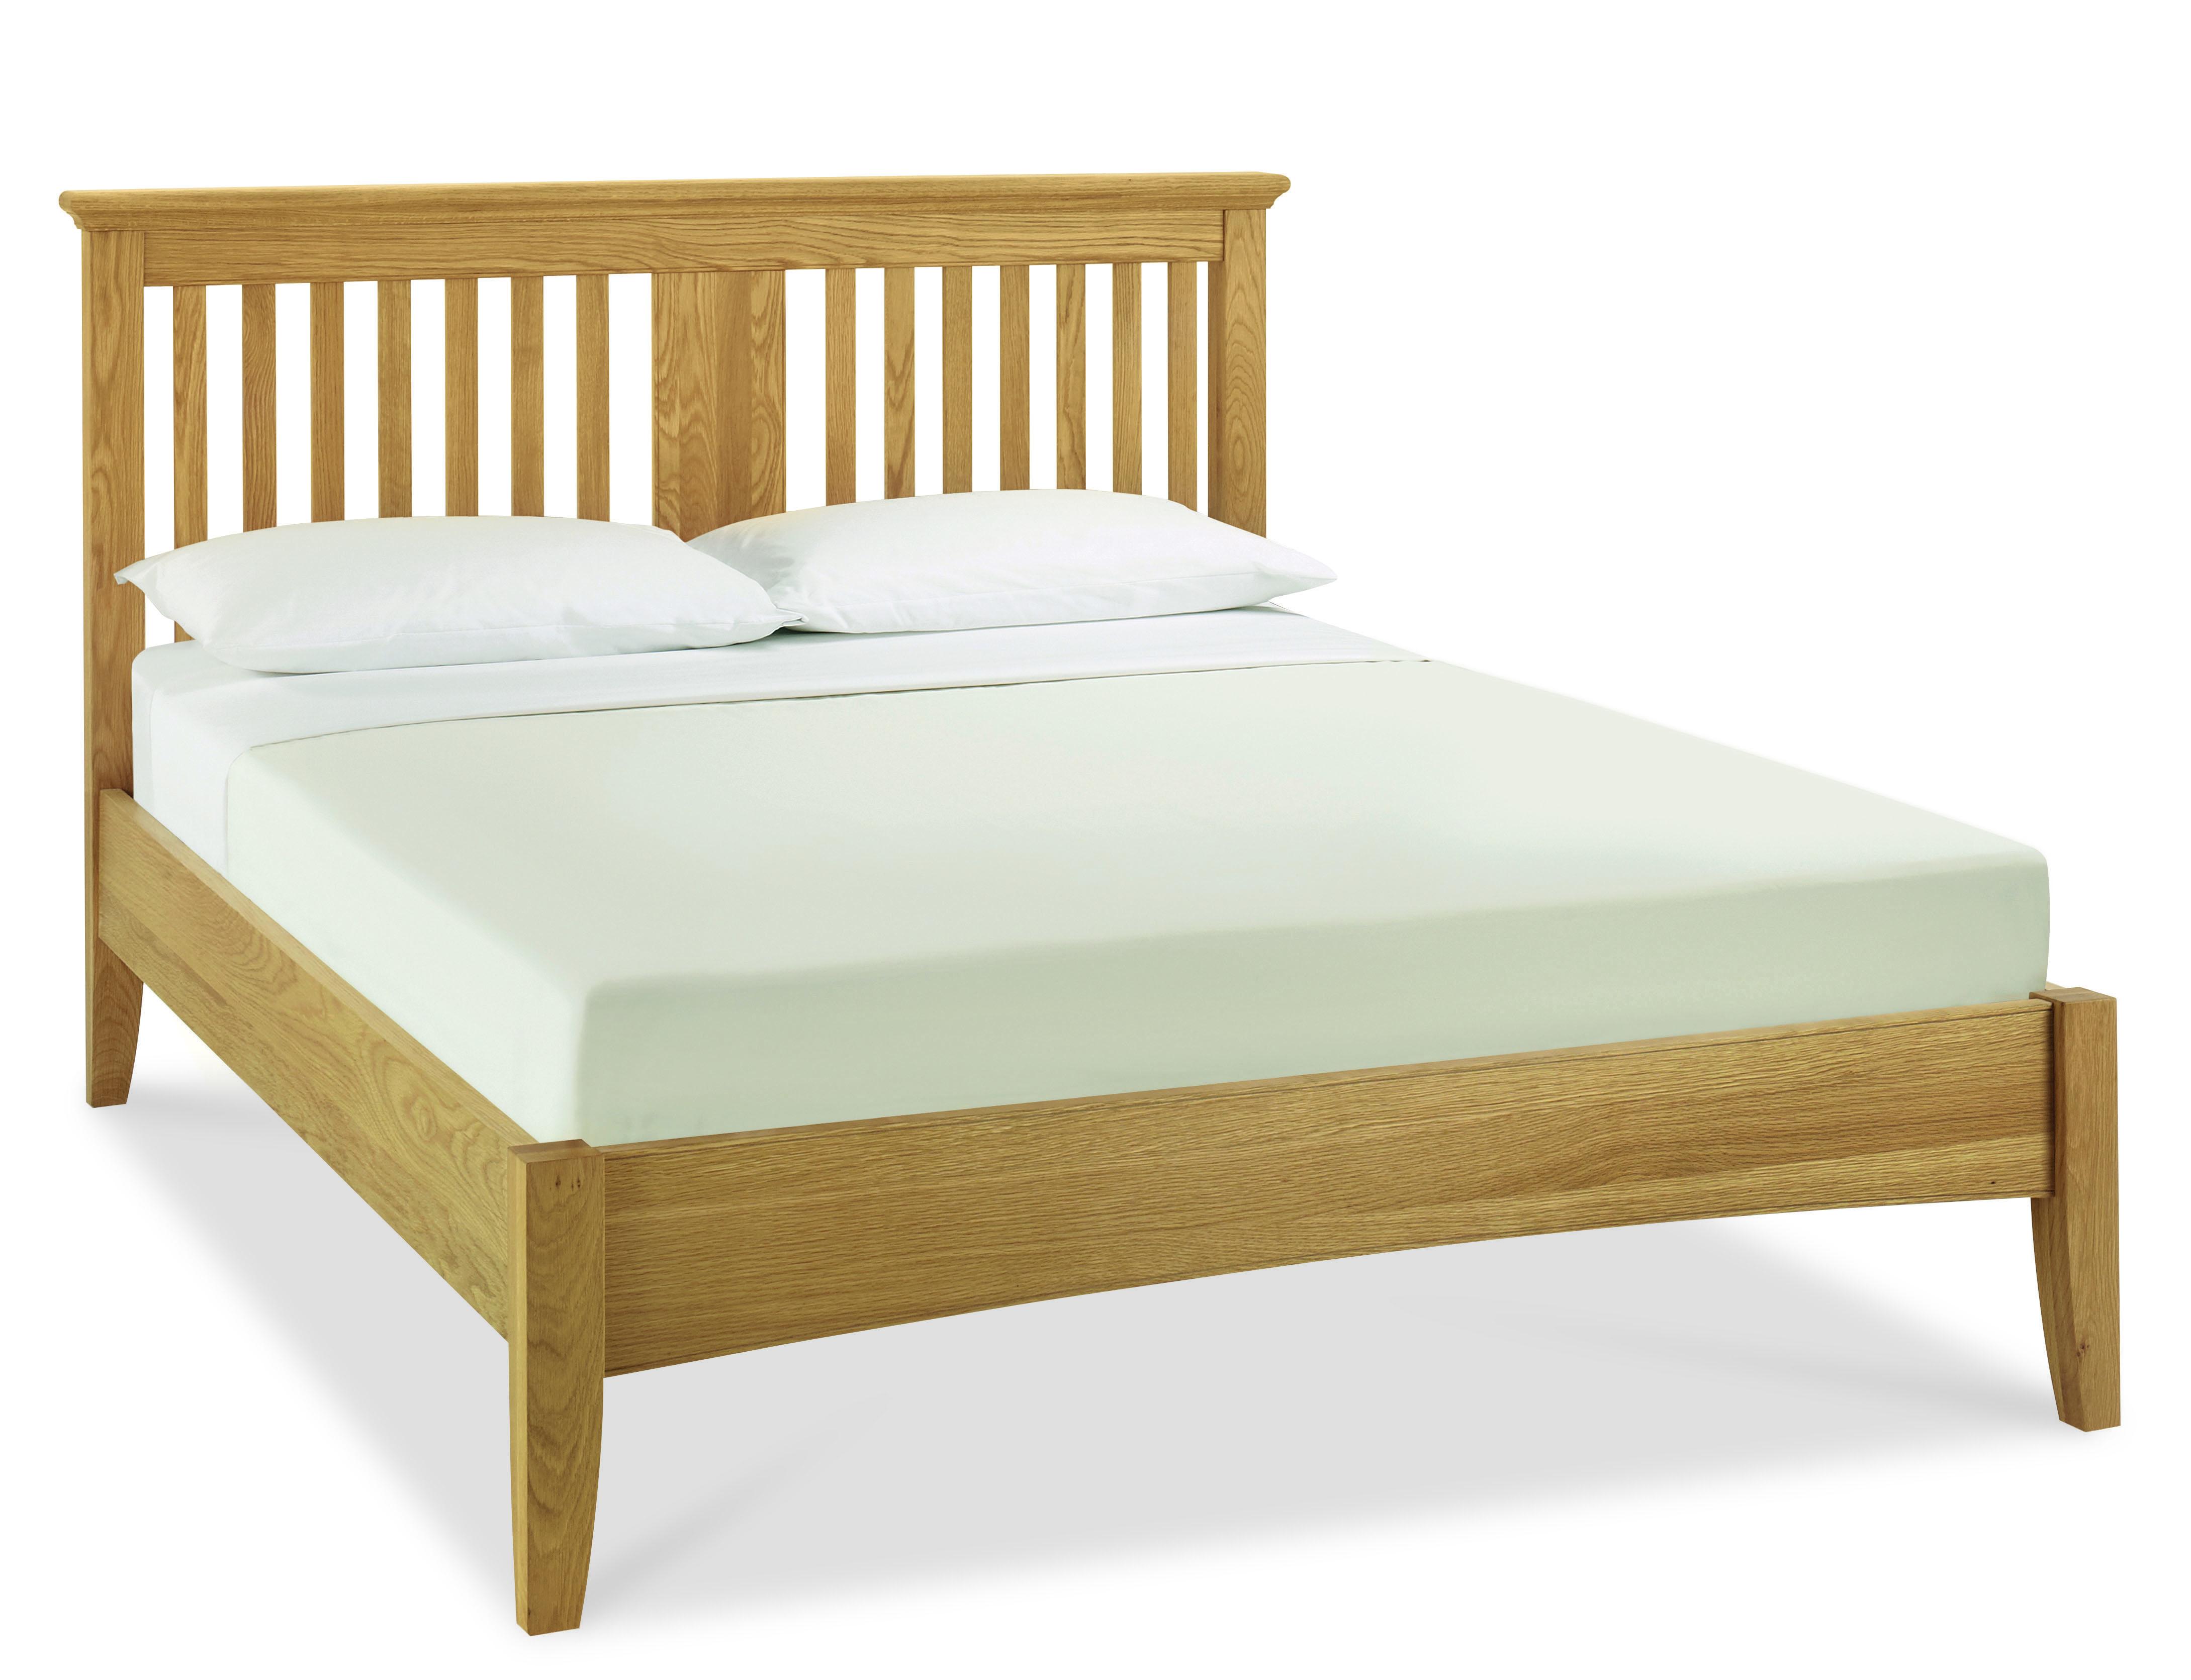 Heronford Oak Slatted Headboard King Size Bed Frame